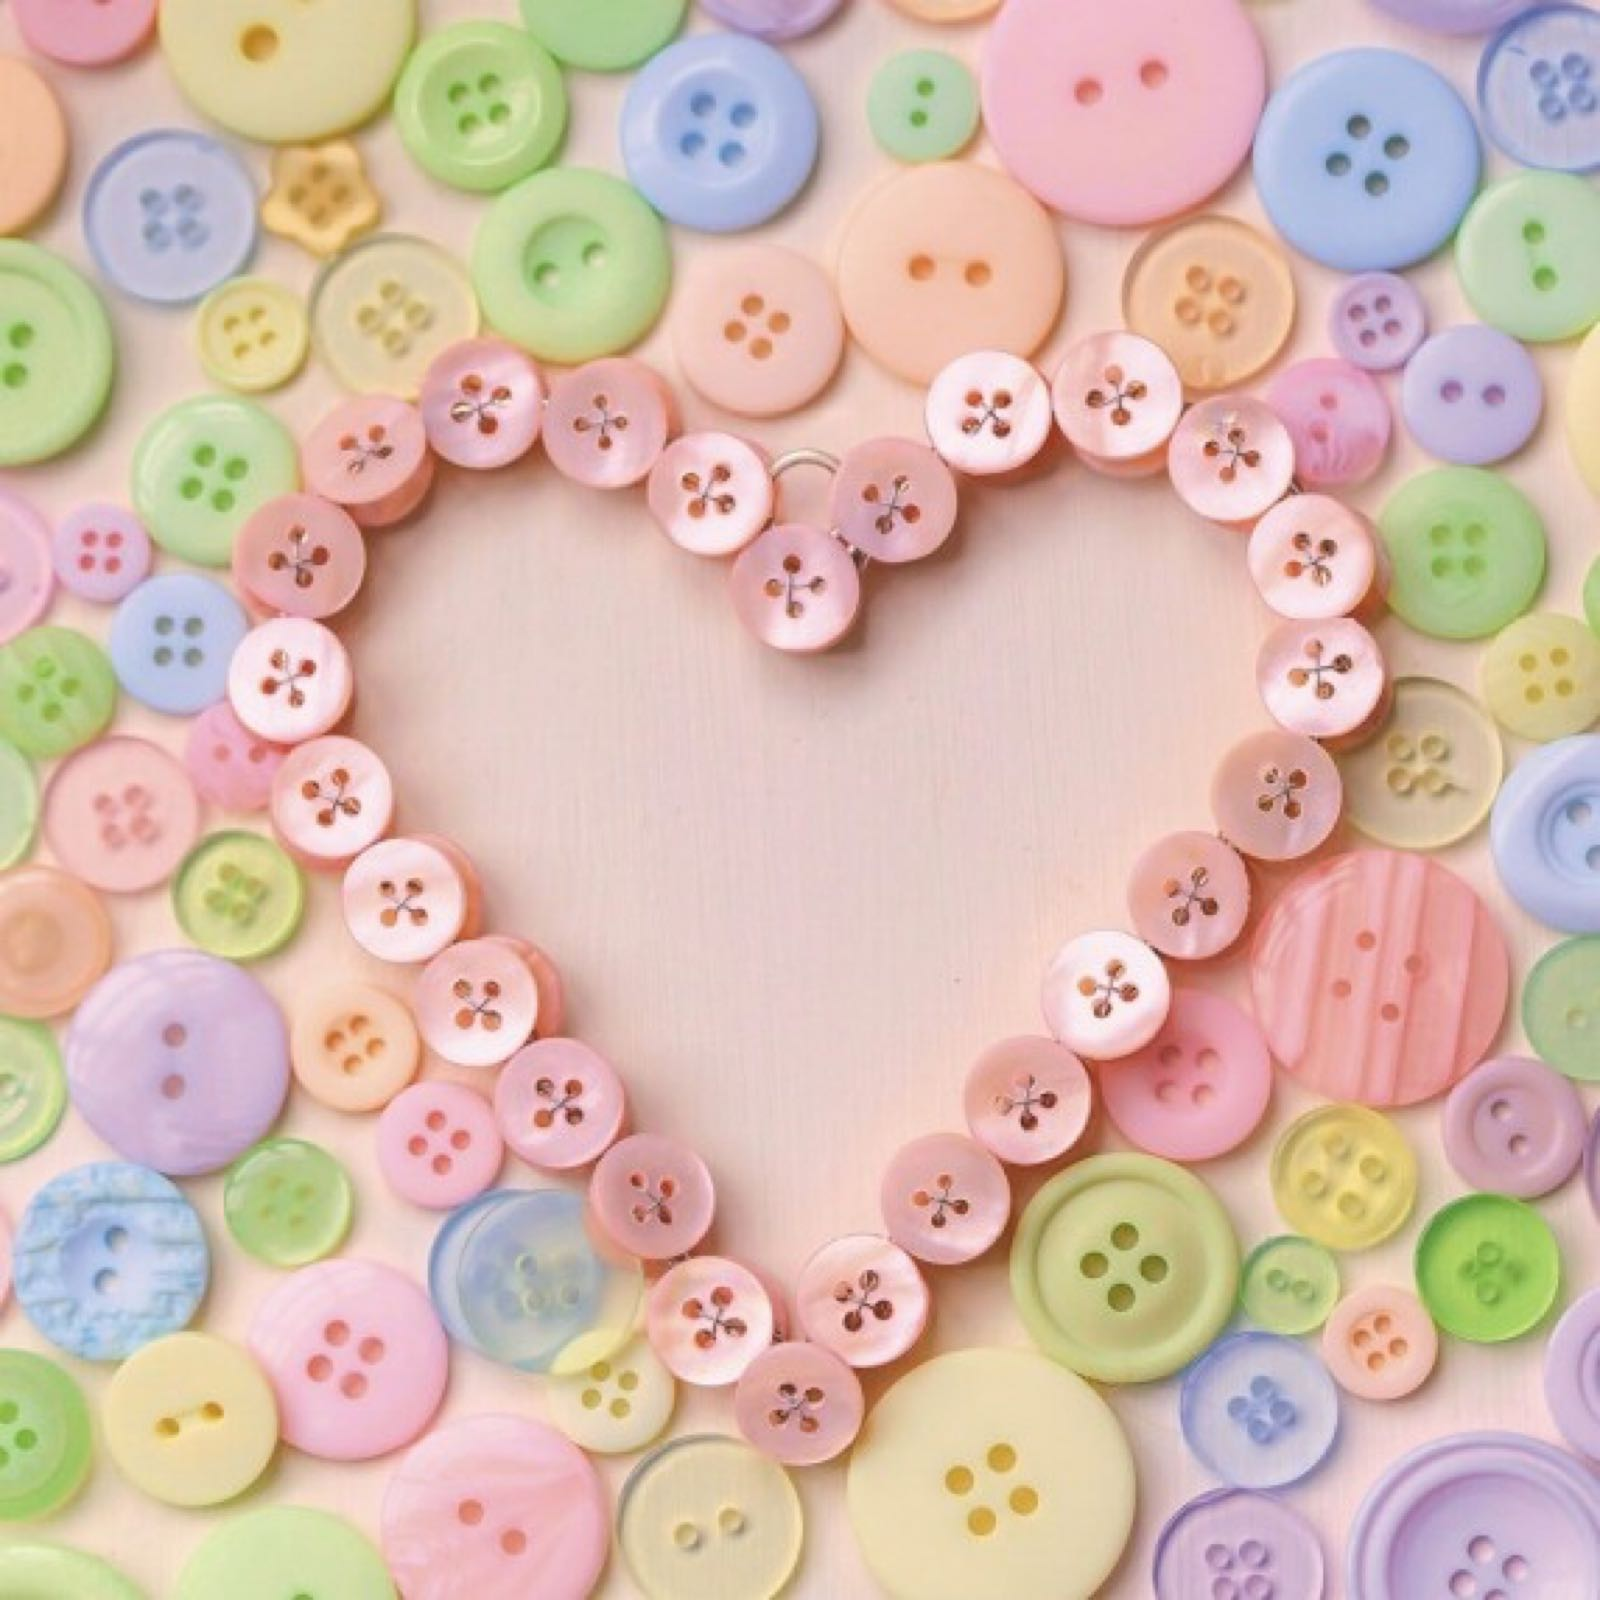 'Buttons Heart' Exposure Card